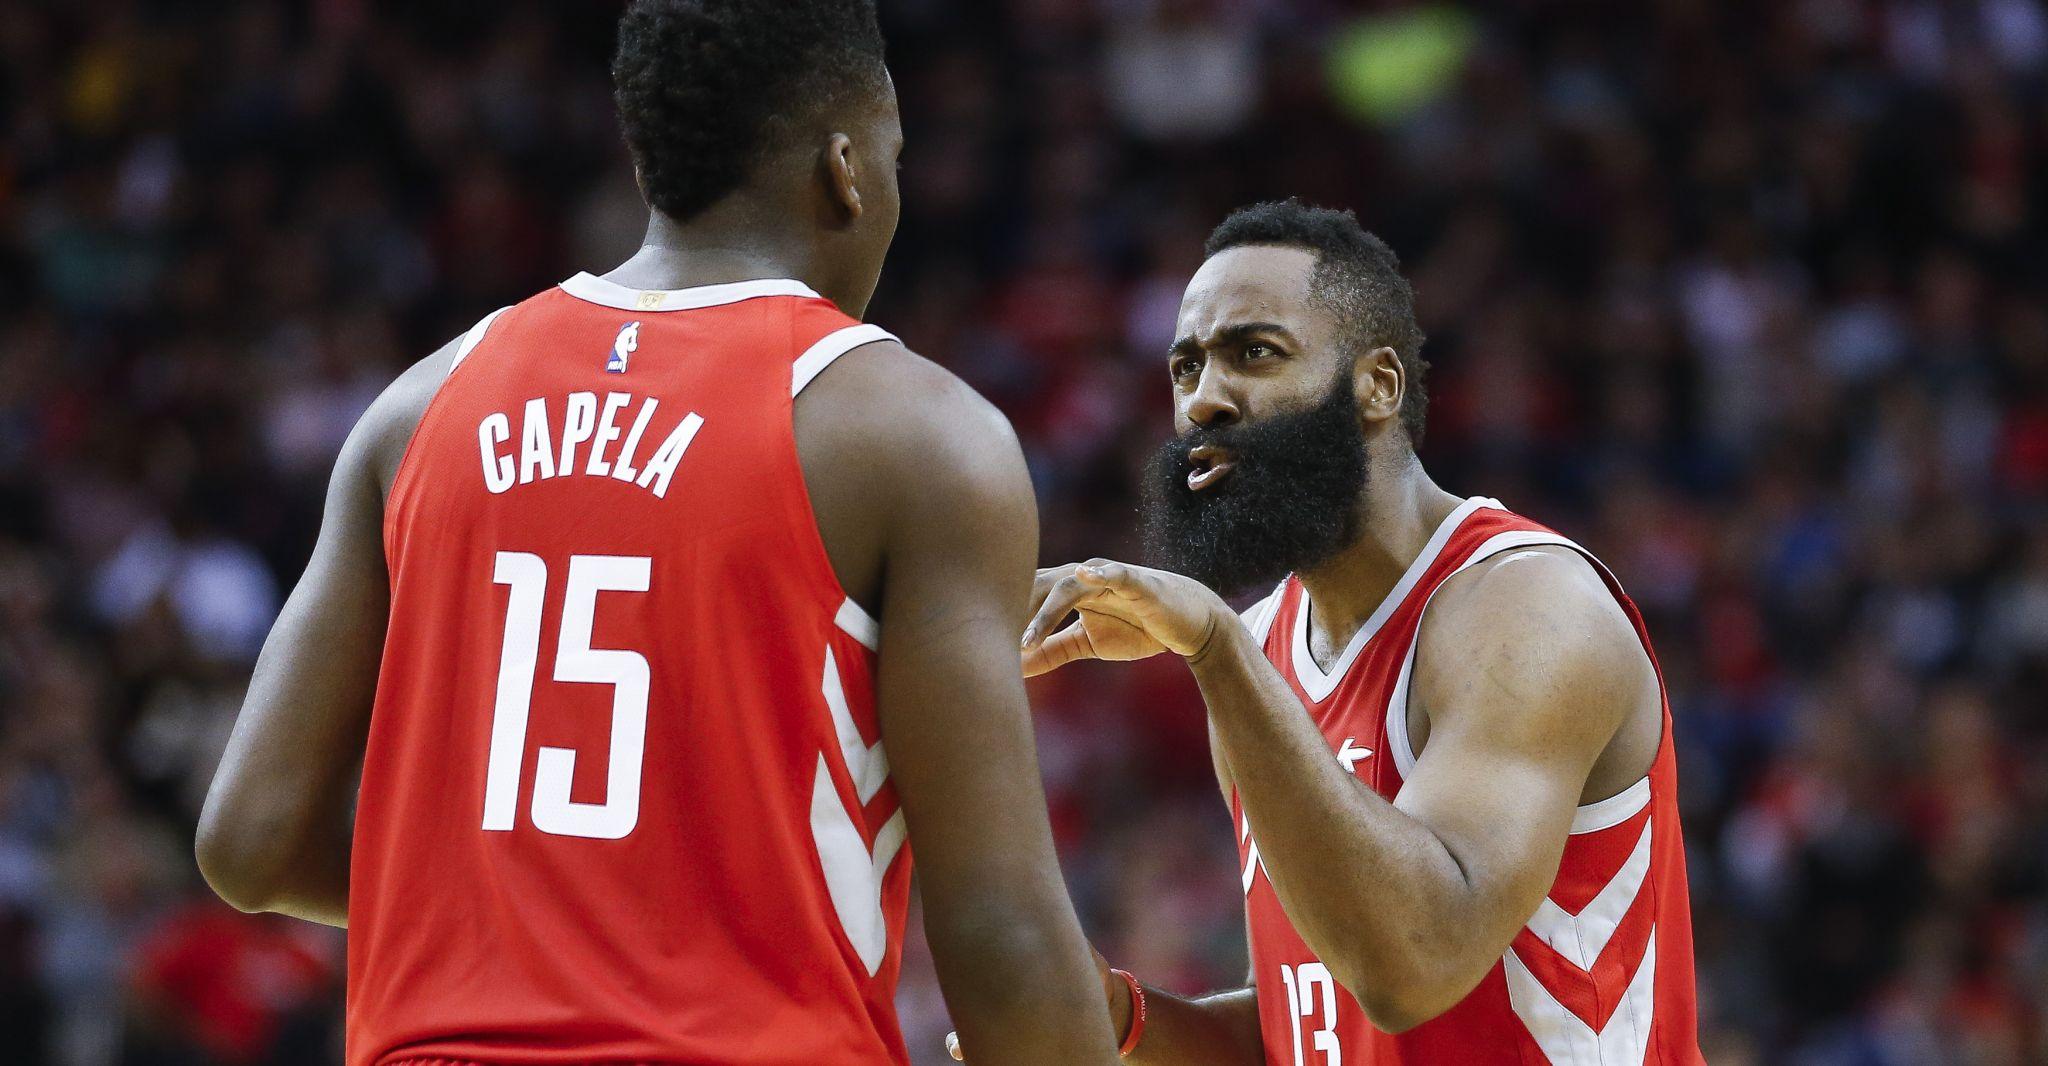 Rockets push winning streak to 8 with victory over Mavericks